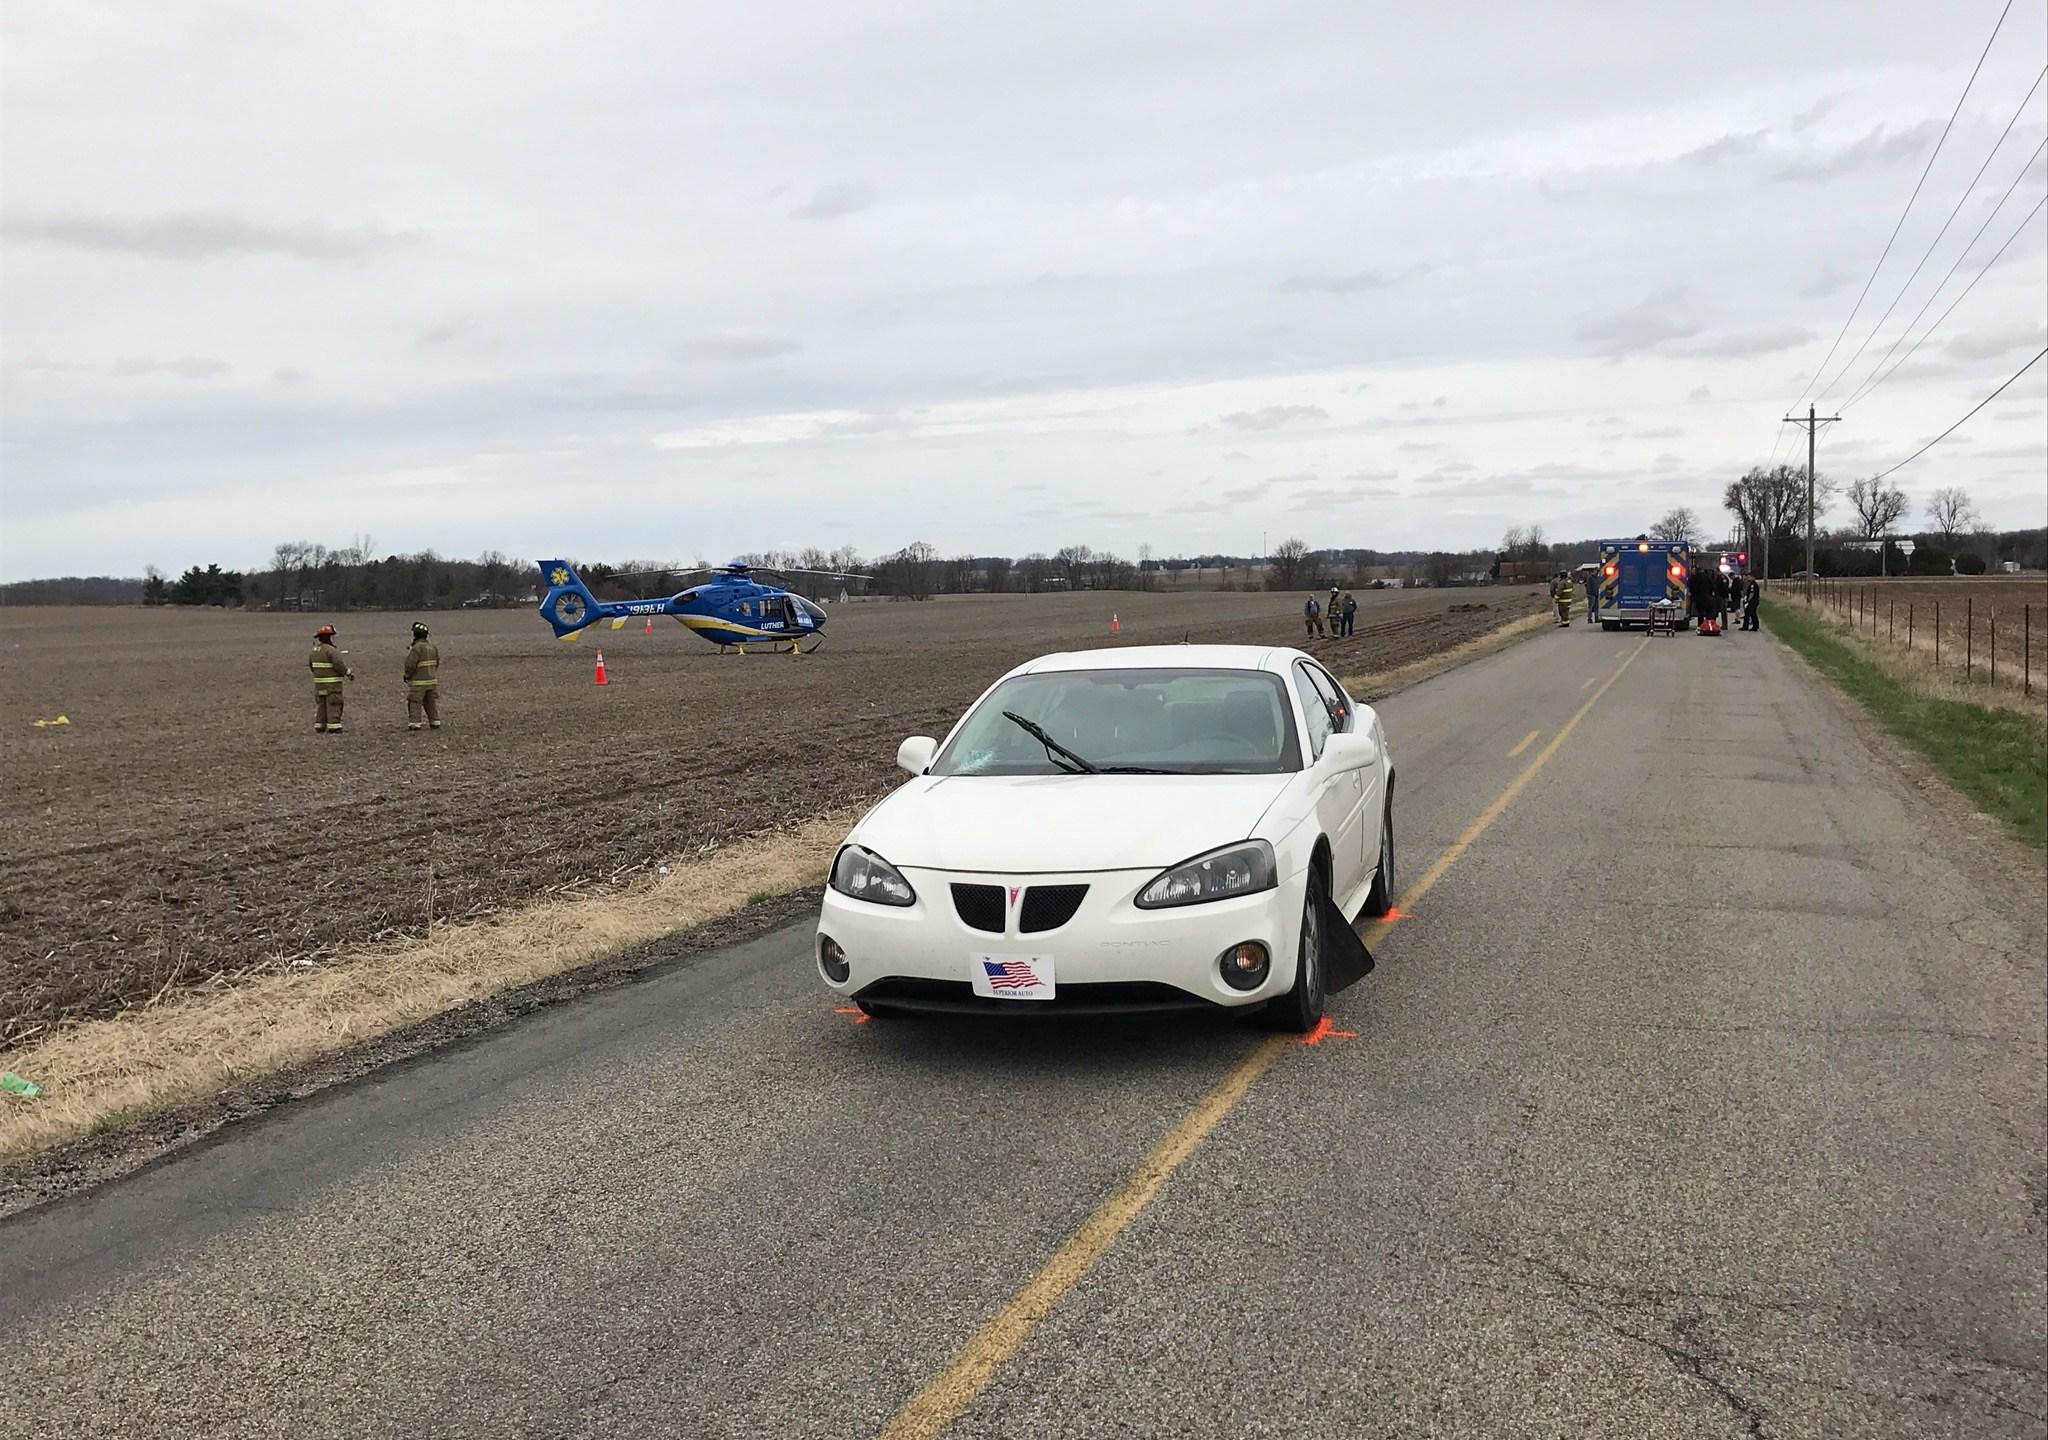 Pedestrian hit in Kosciusko County